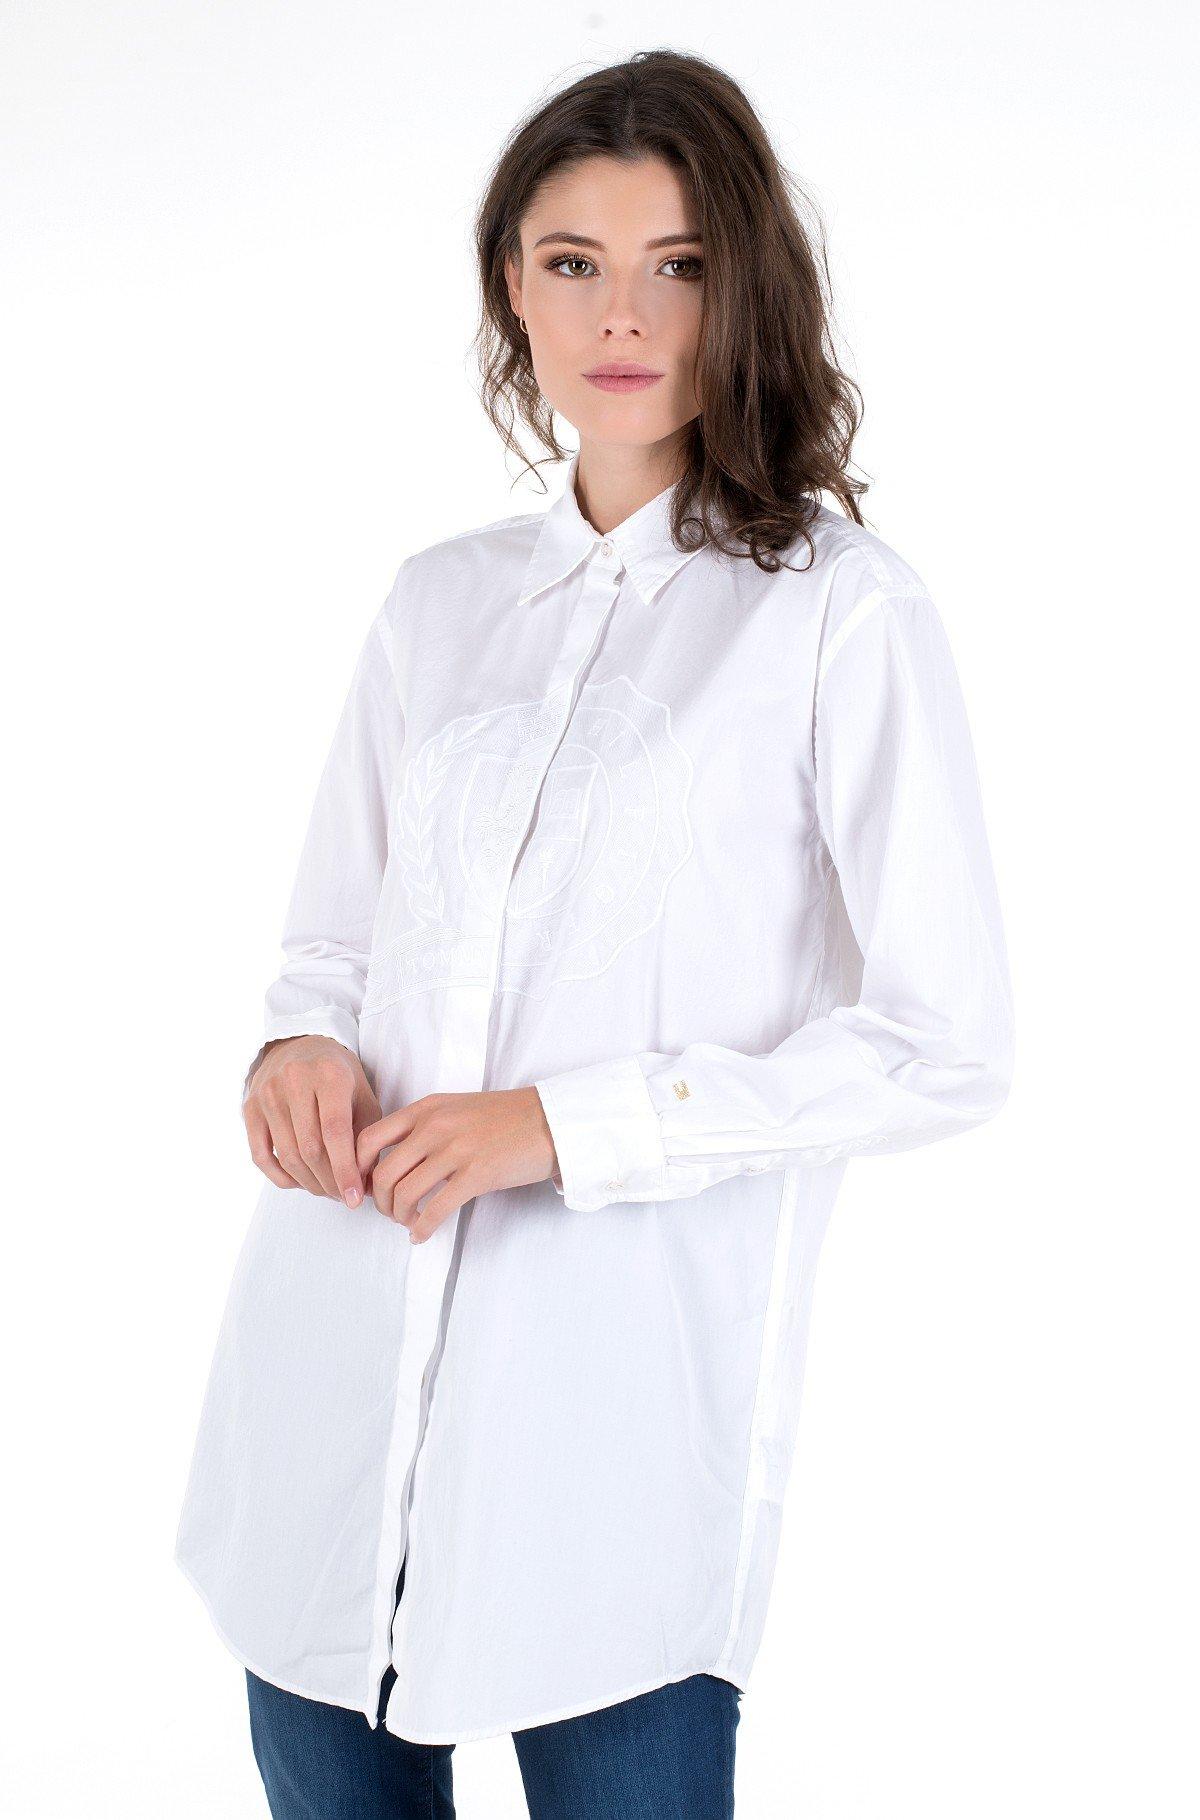 Shirt ICON TEDDY SHIRT LS W5-full-1